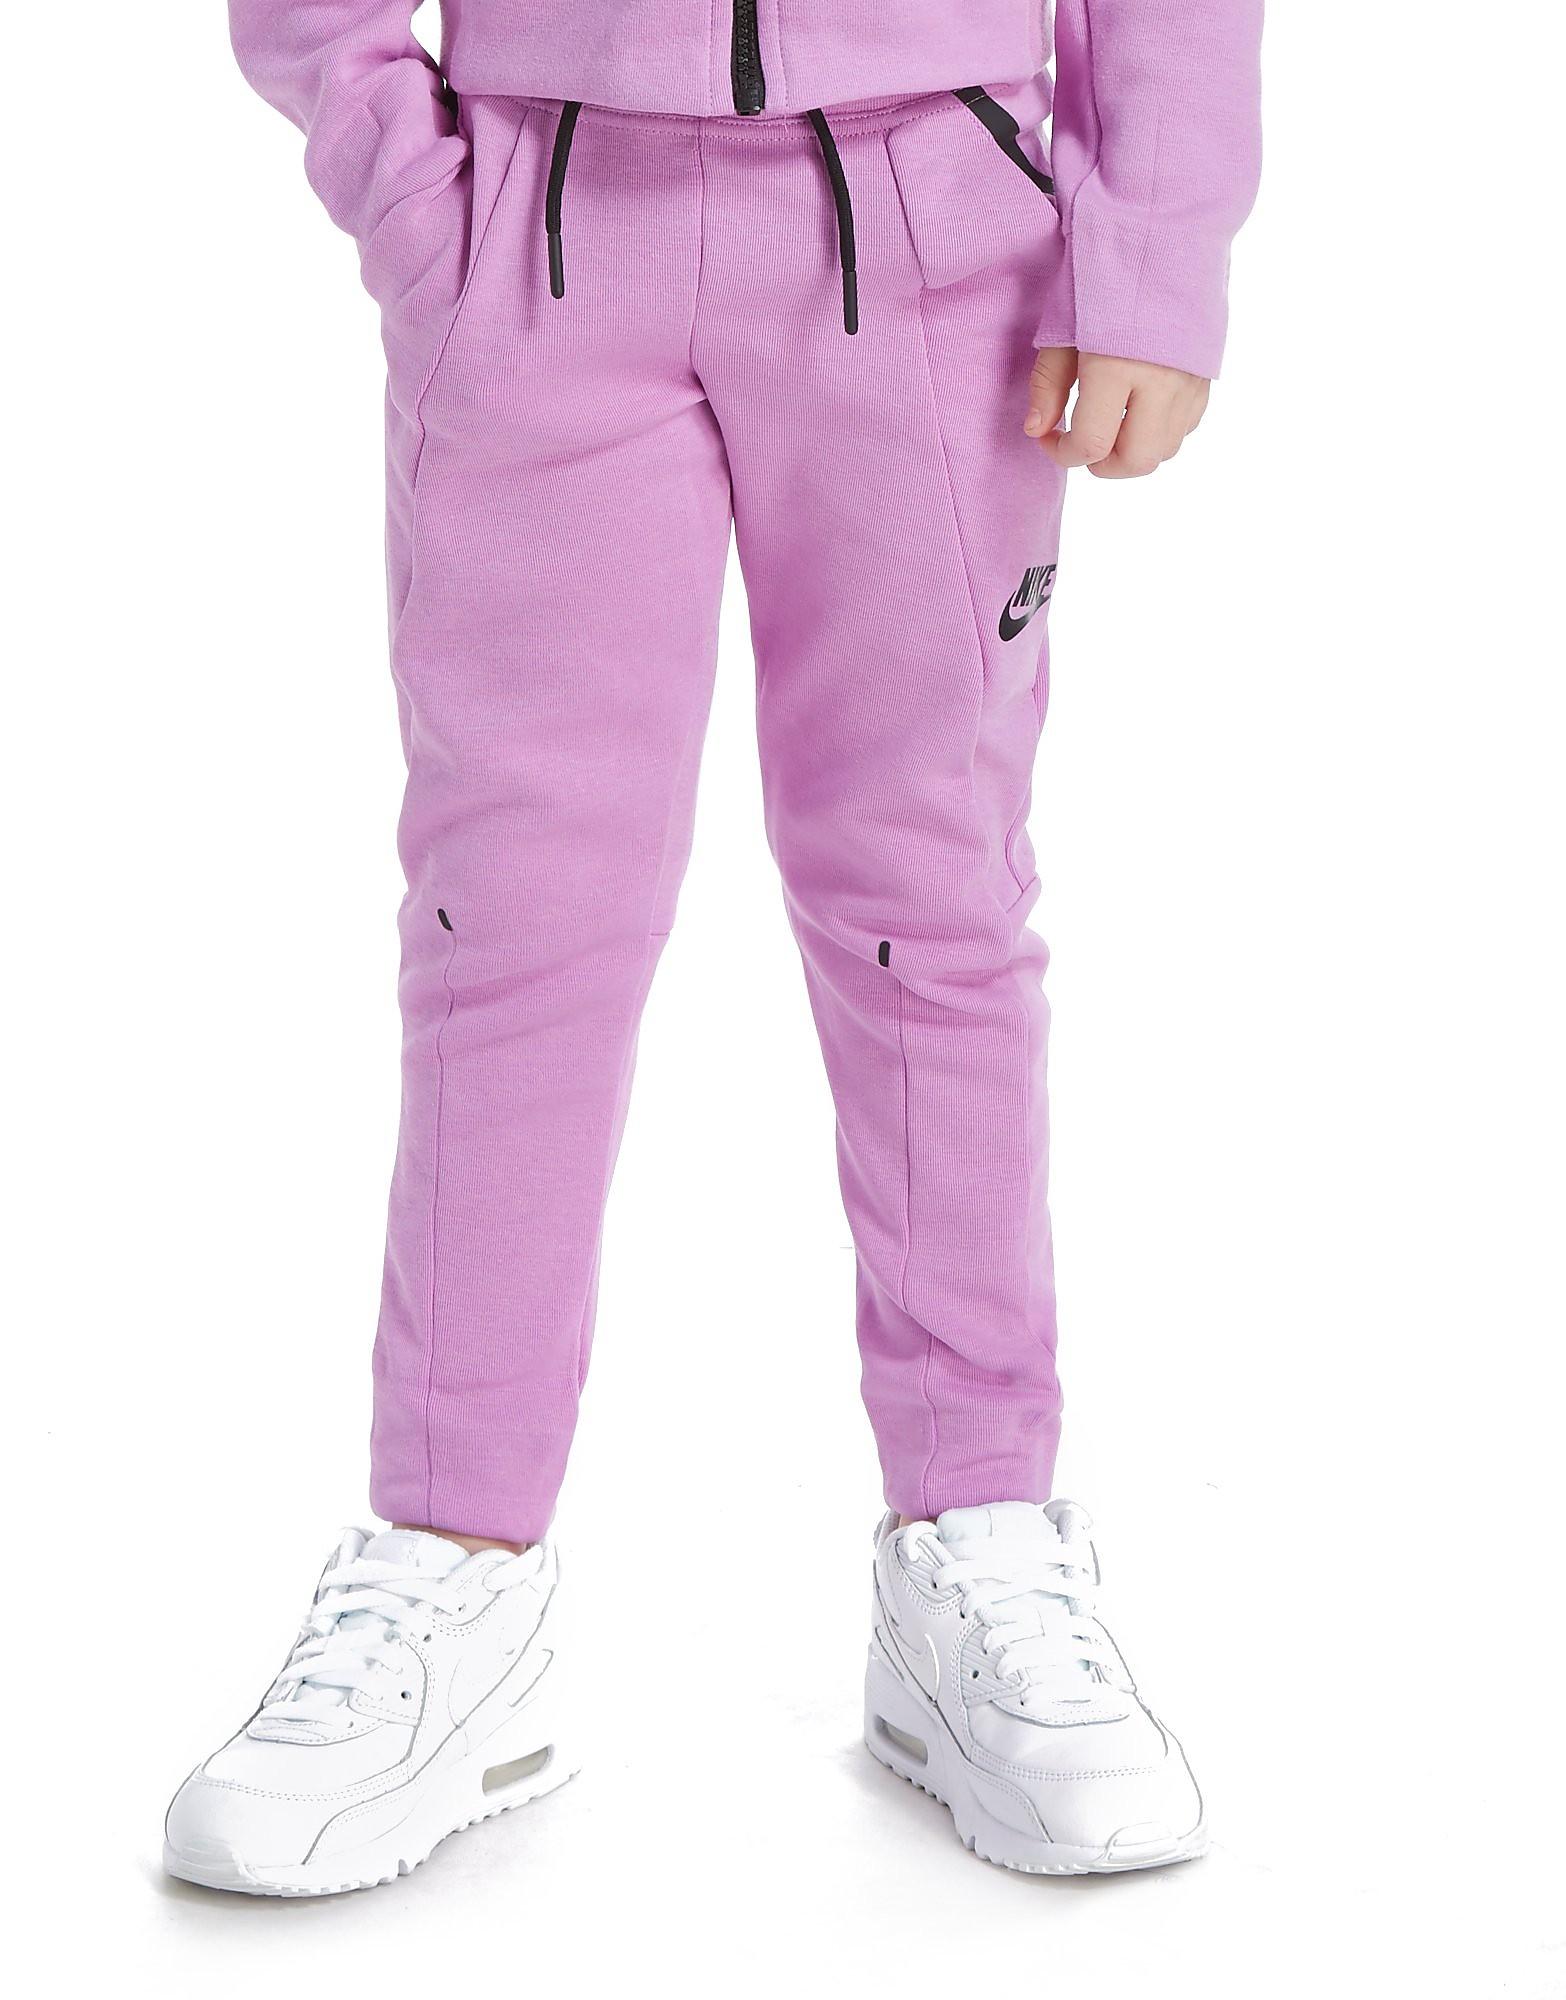 Nike Girls' Tech Fleece Pants Children